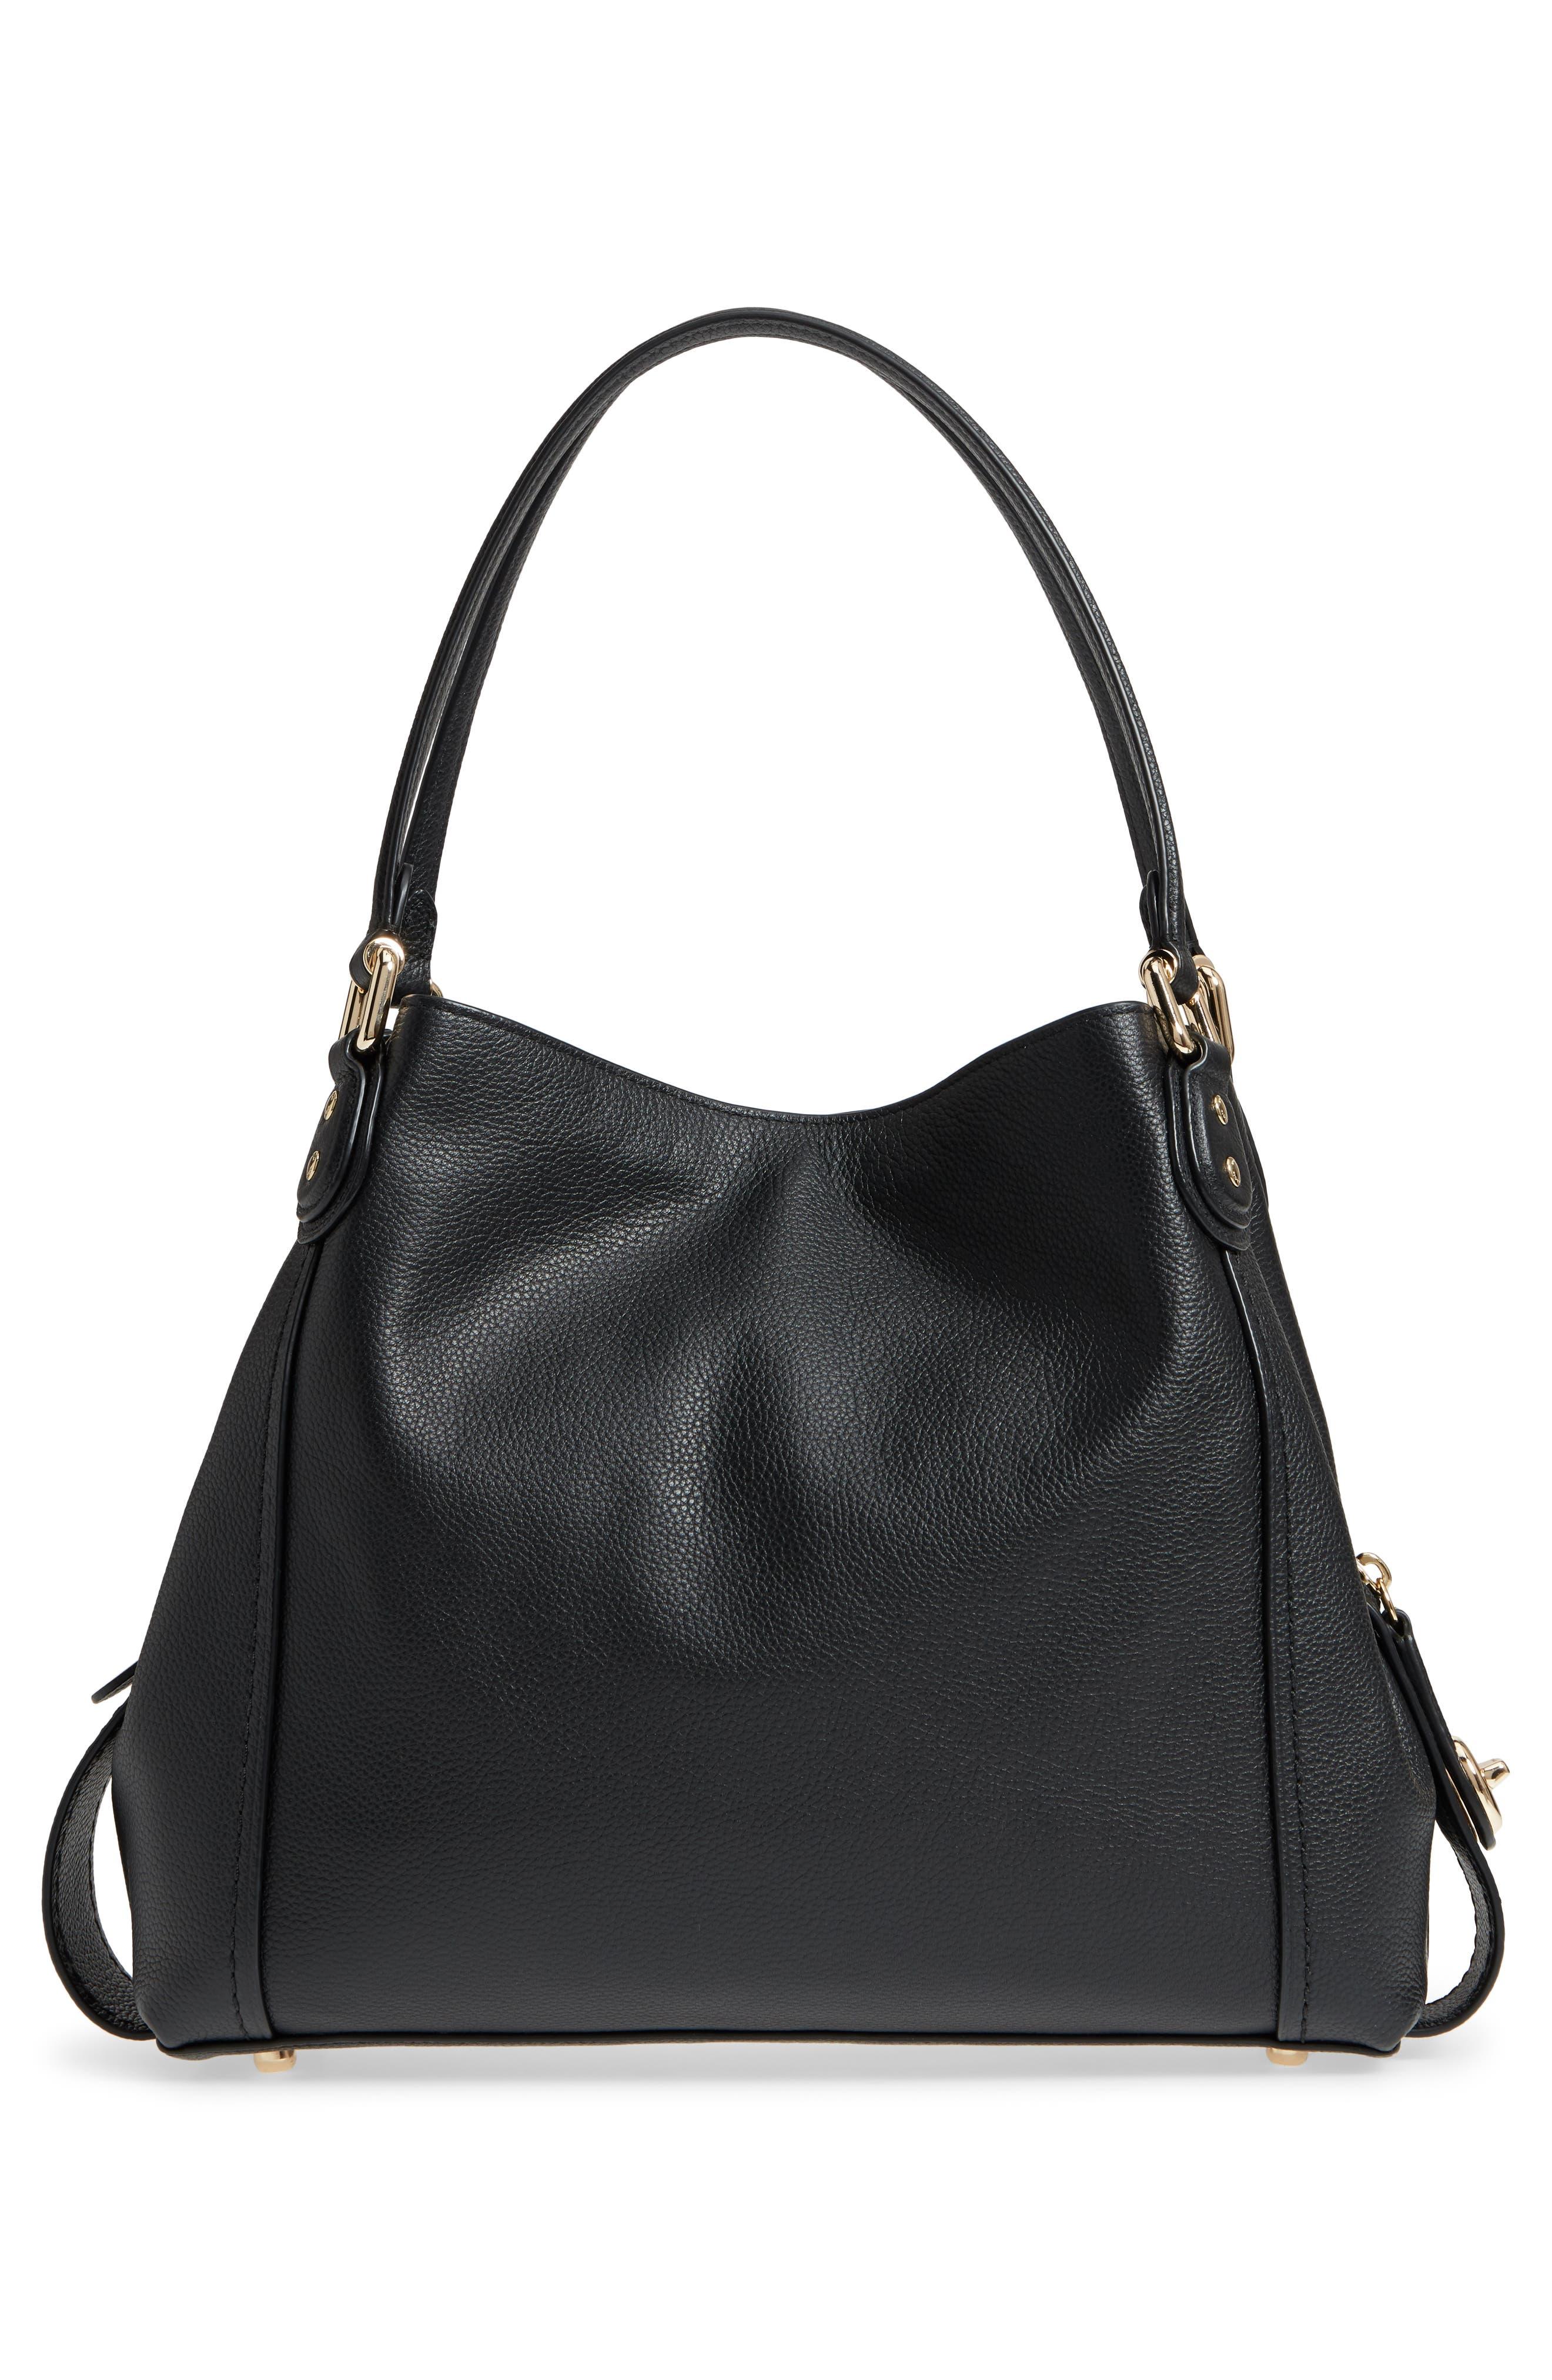 Edie 31 Pebbled Leather Shoulder Bag,                             Alternate thumbnail 3, color,                             BLACK